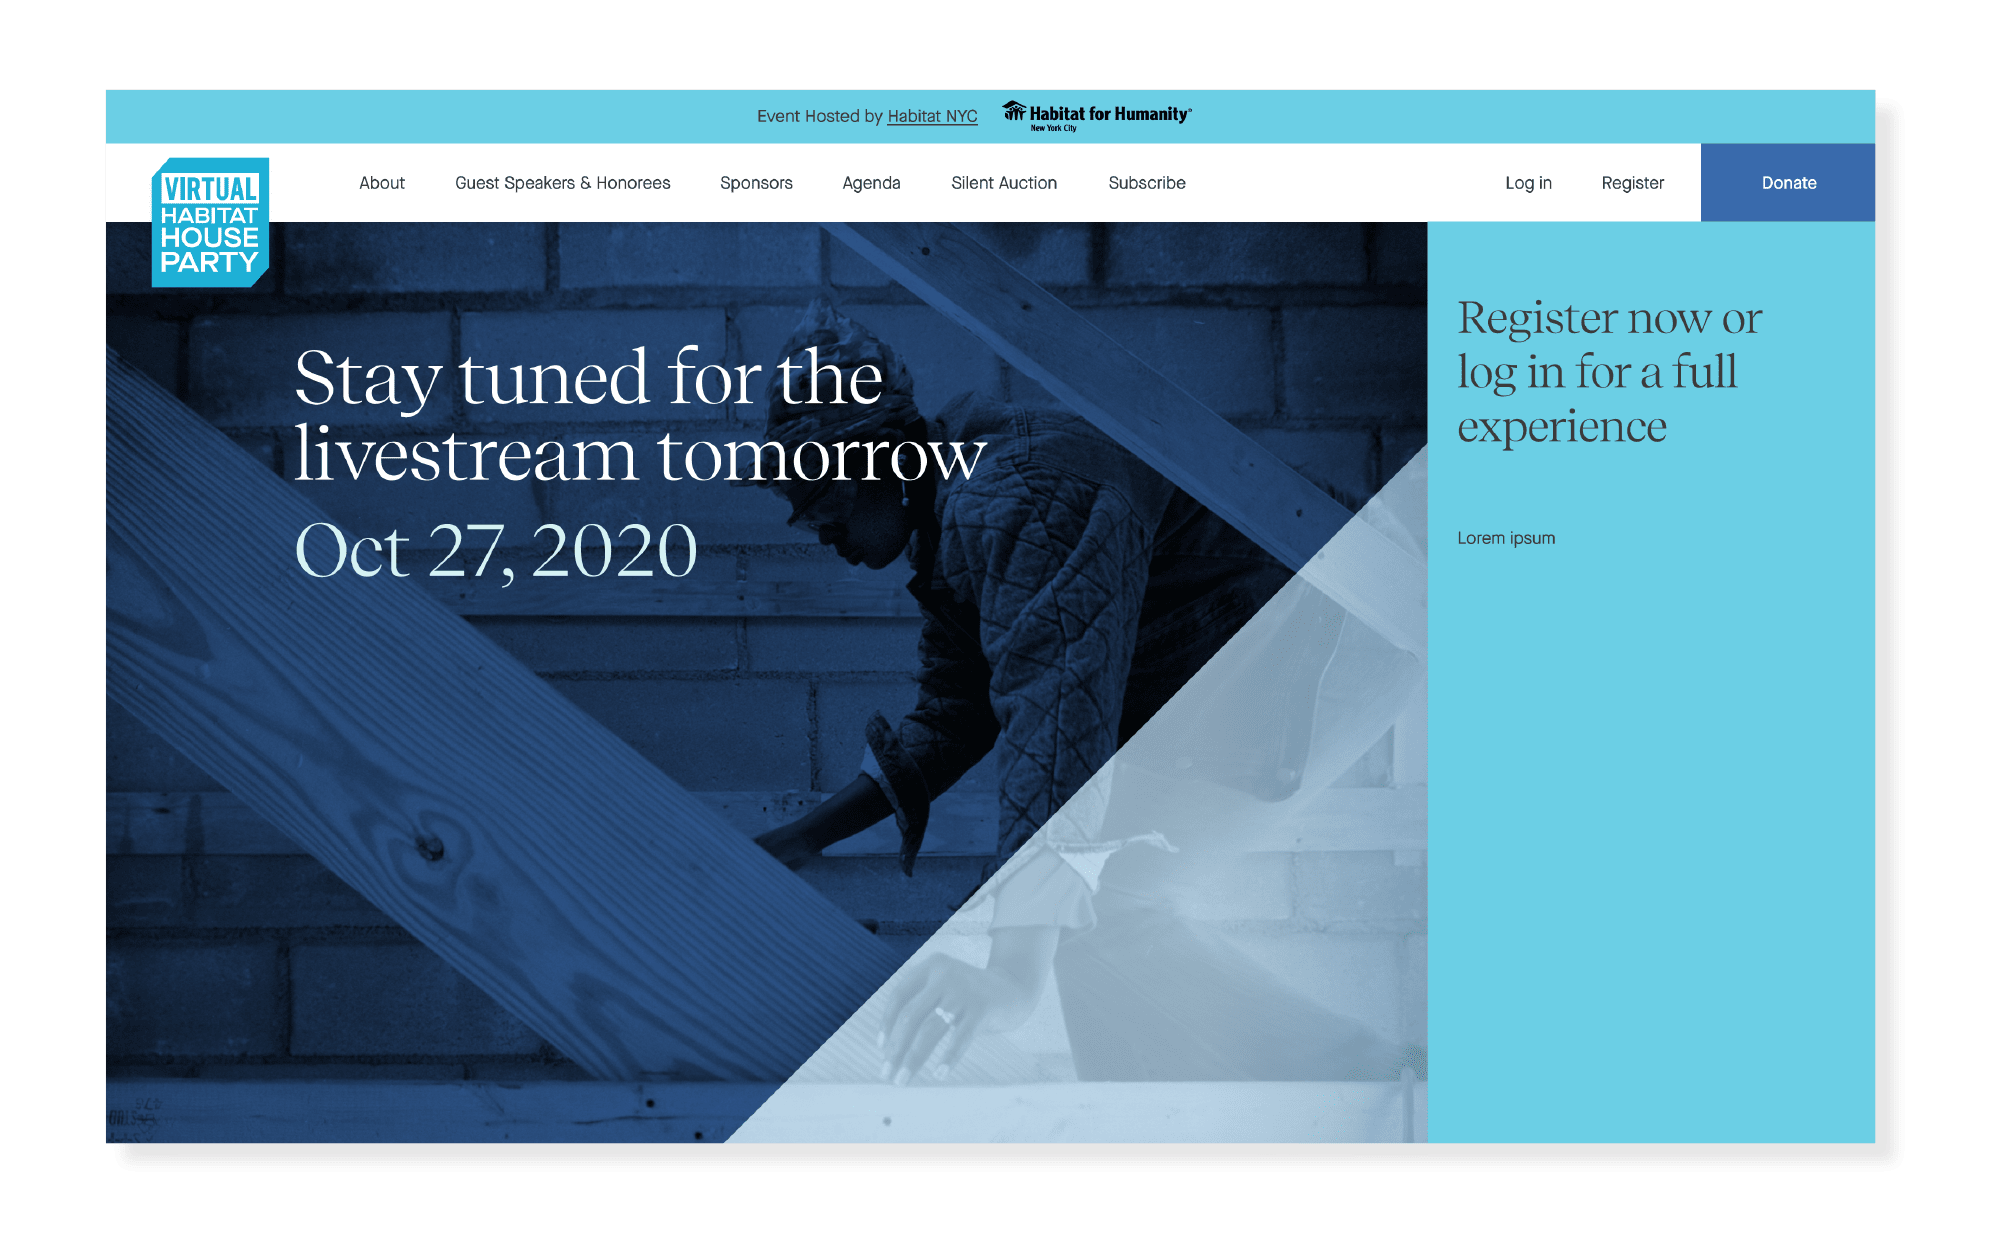 Virtual Habitat House Party 2020